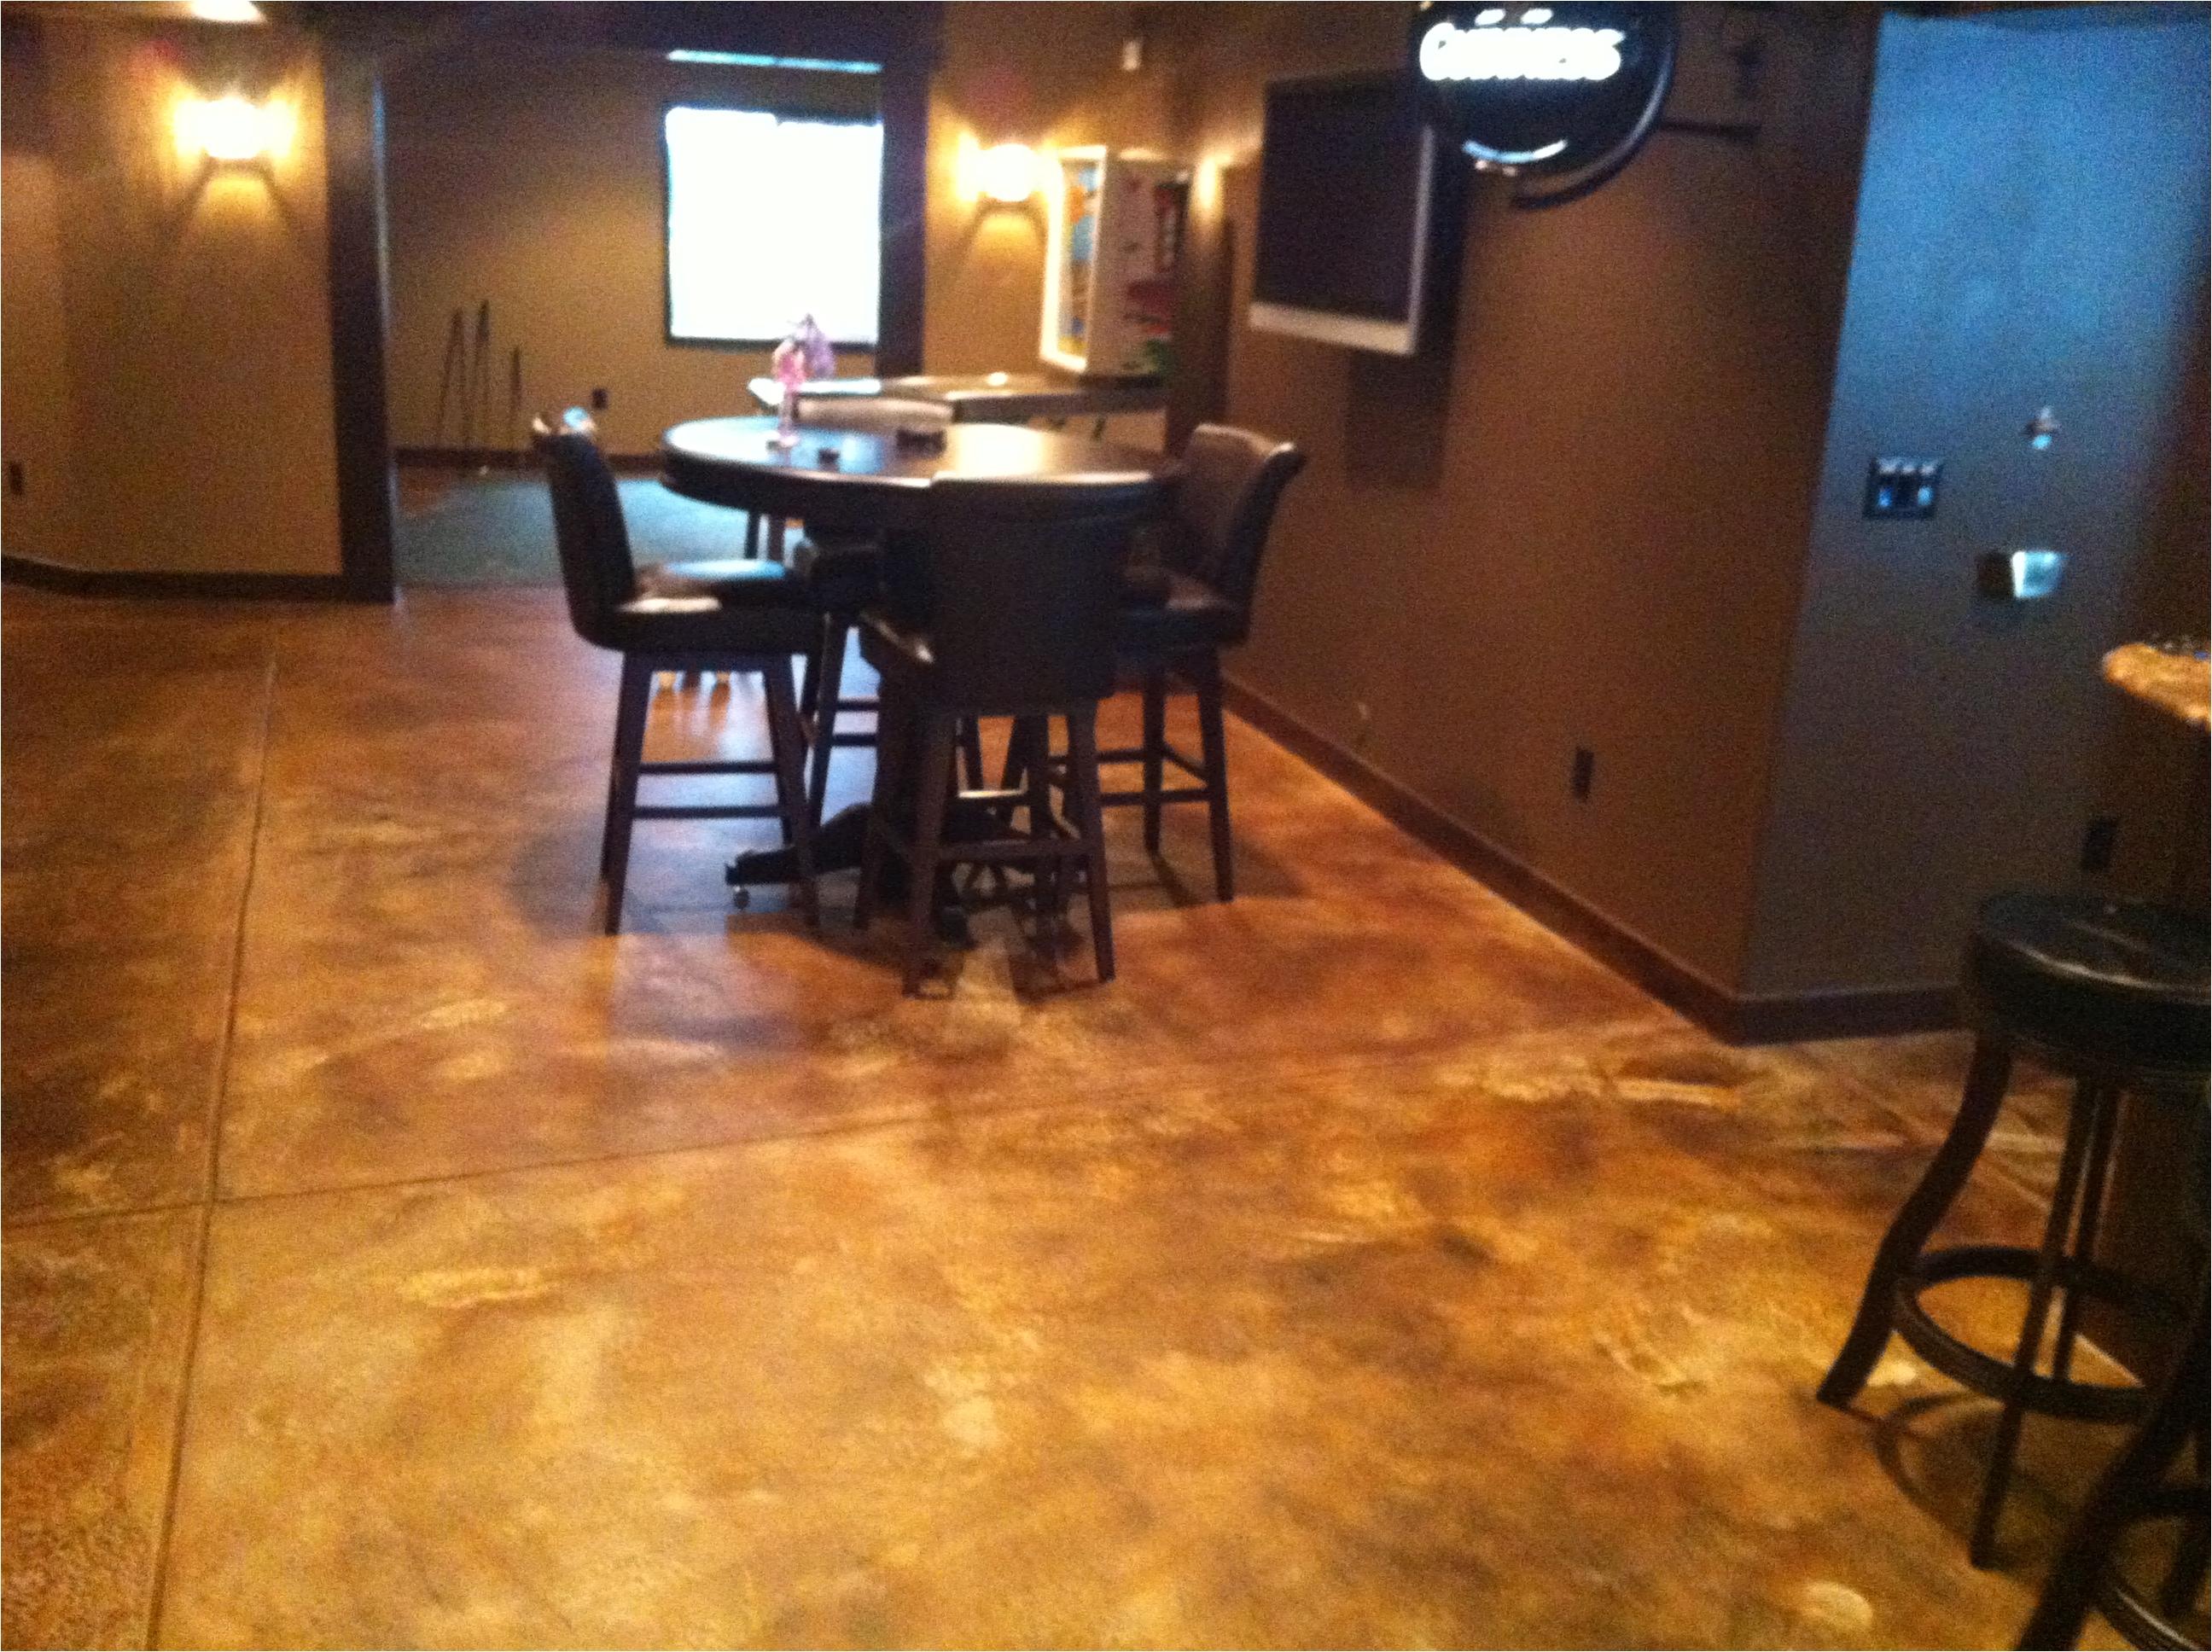 Best Concrete Floor Sealant BradsHomeFurnishings - Best type of flooring for basement concrete floor